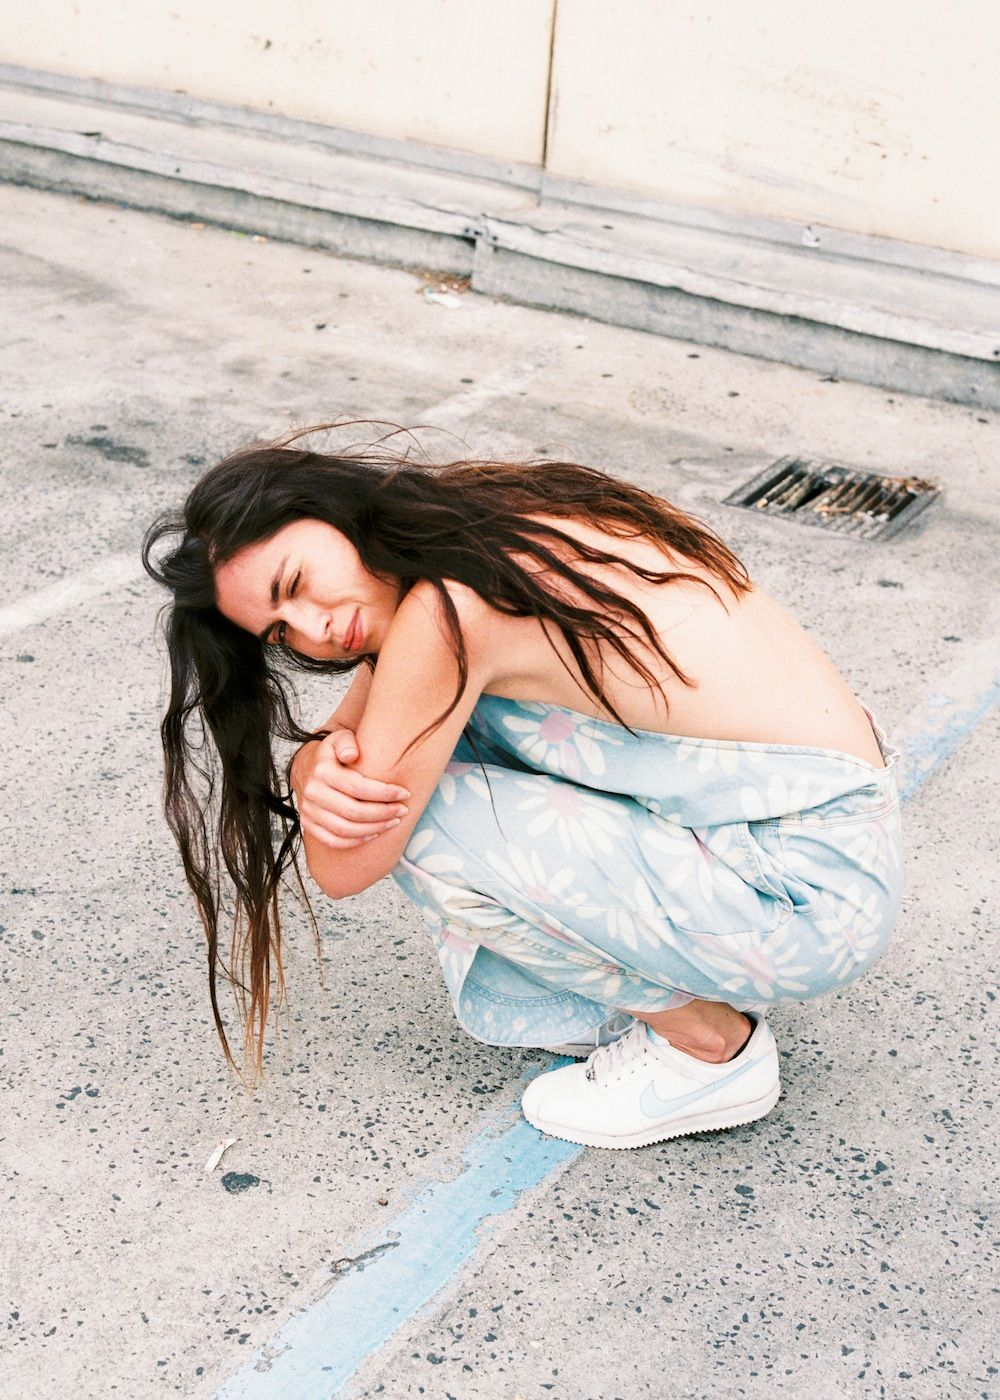 Urban Outfitters - Blog - Tumblr Tuesday: Heather Lighton